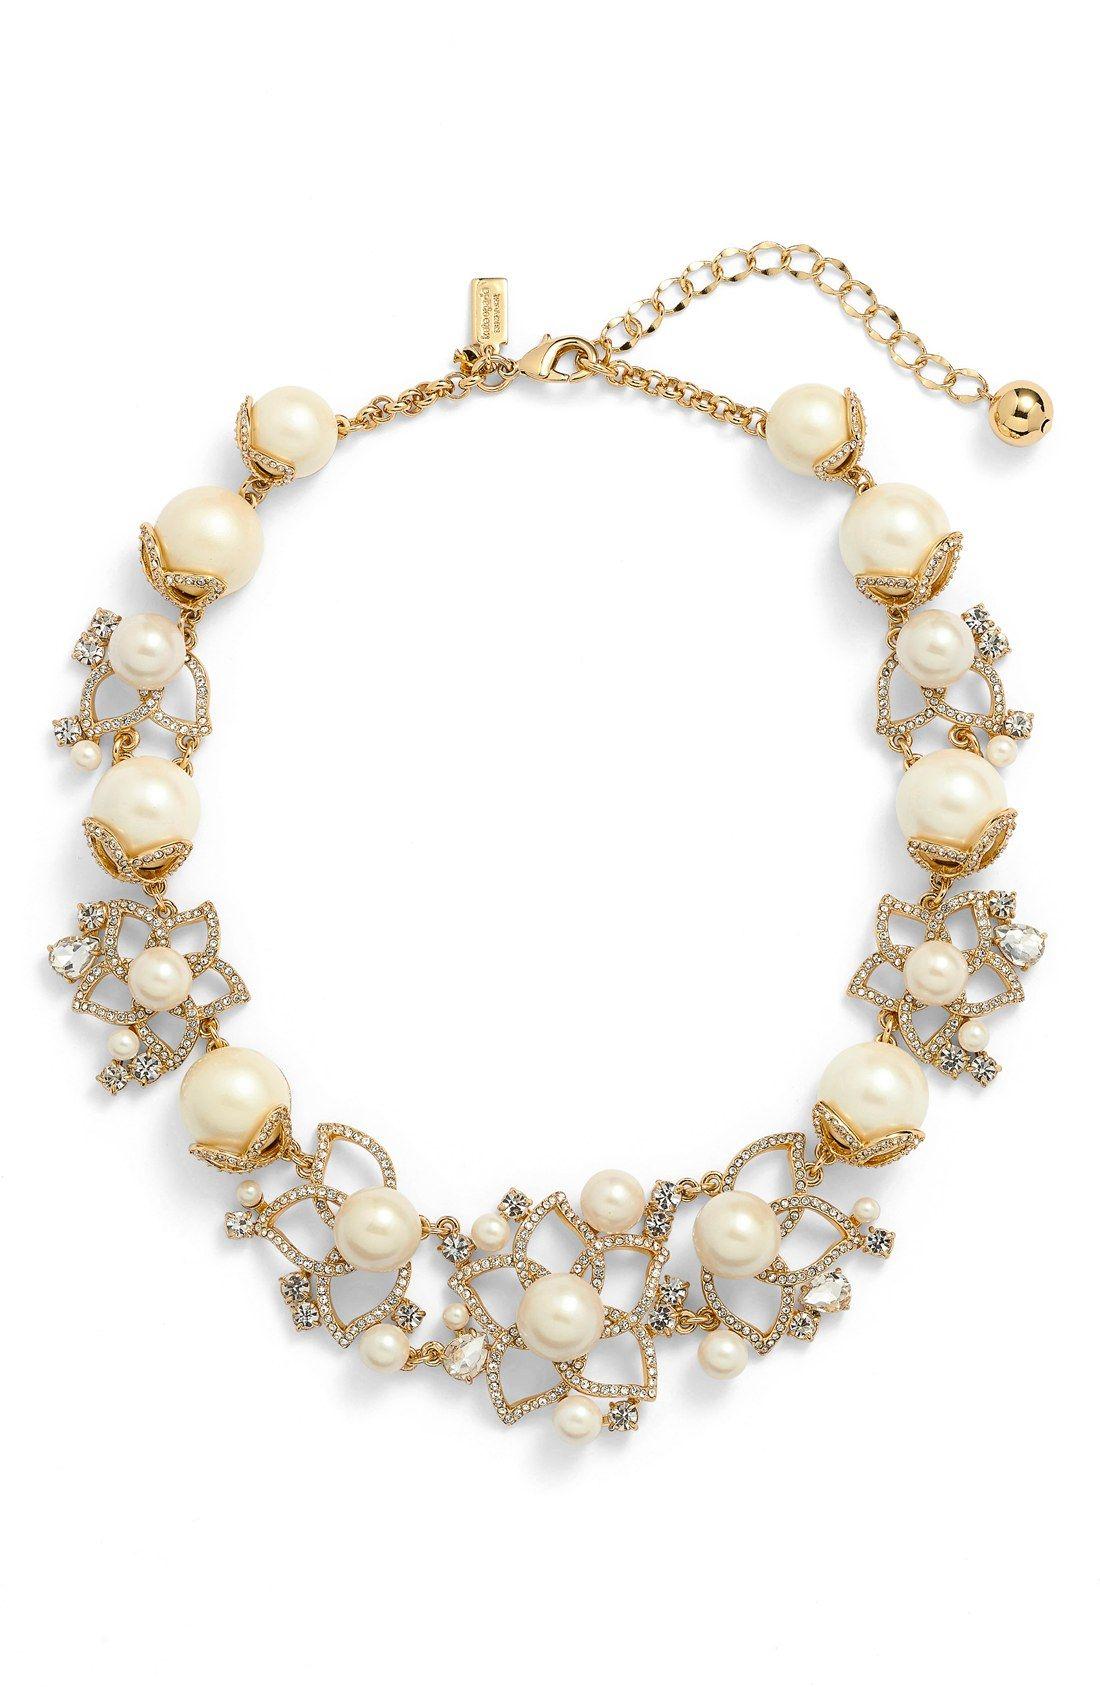 Kate Spade Bridal Necklace Bouquet Faux Pearl Statement